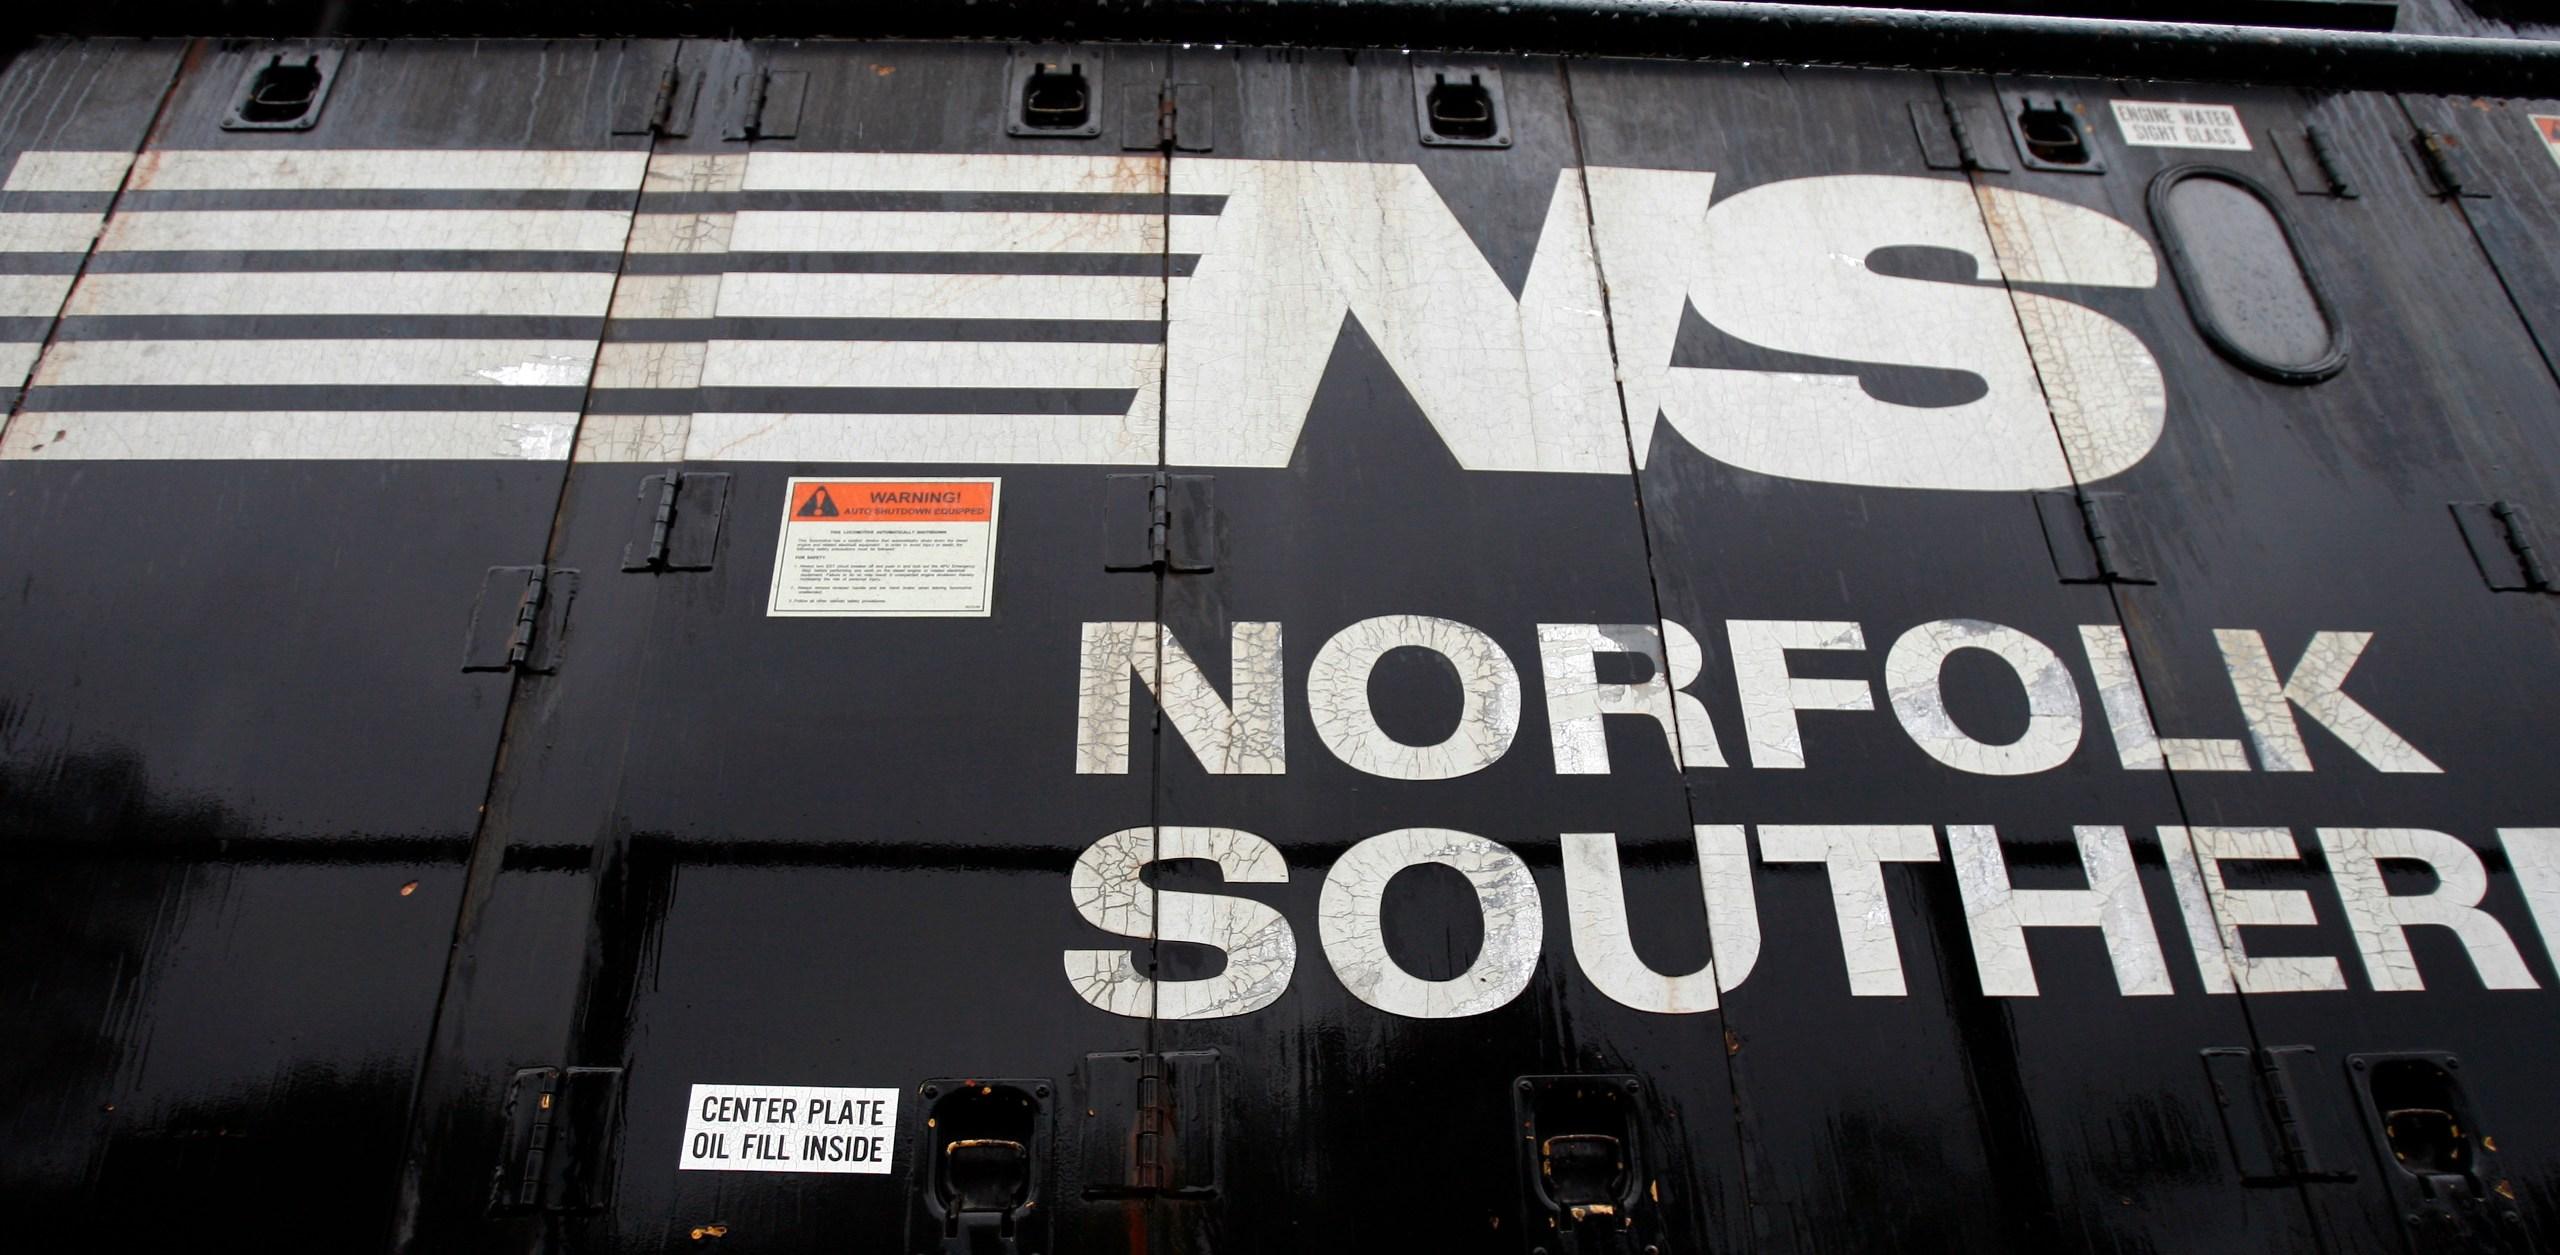 Earns Norfolk Southern_294802